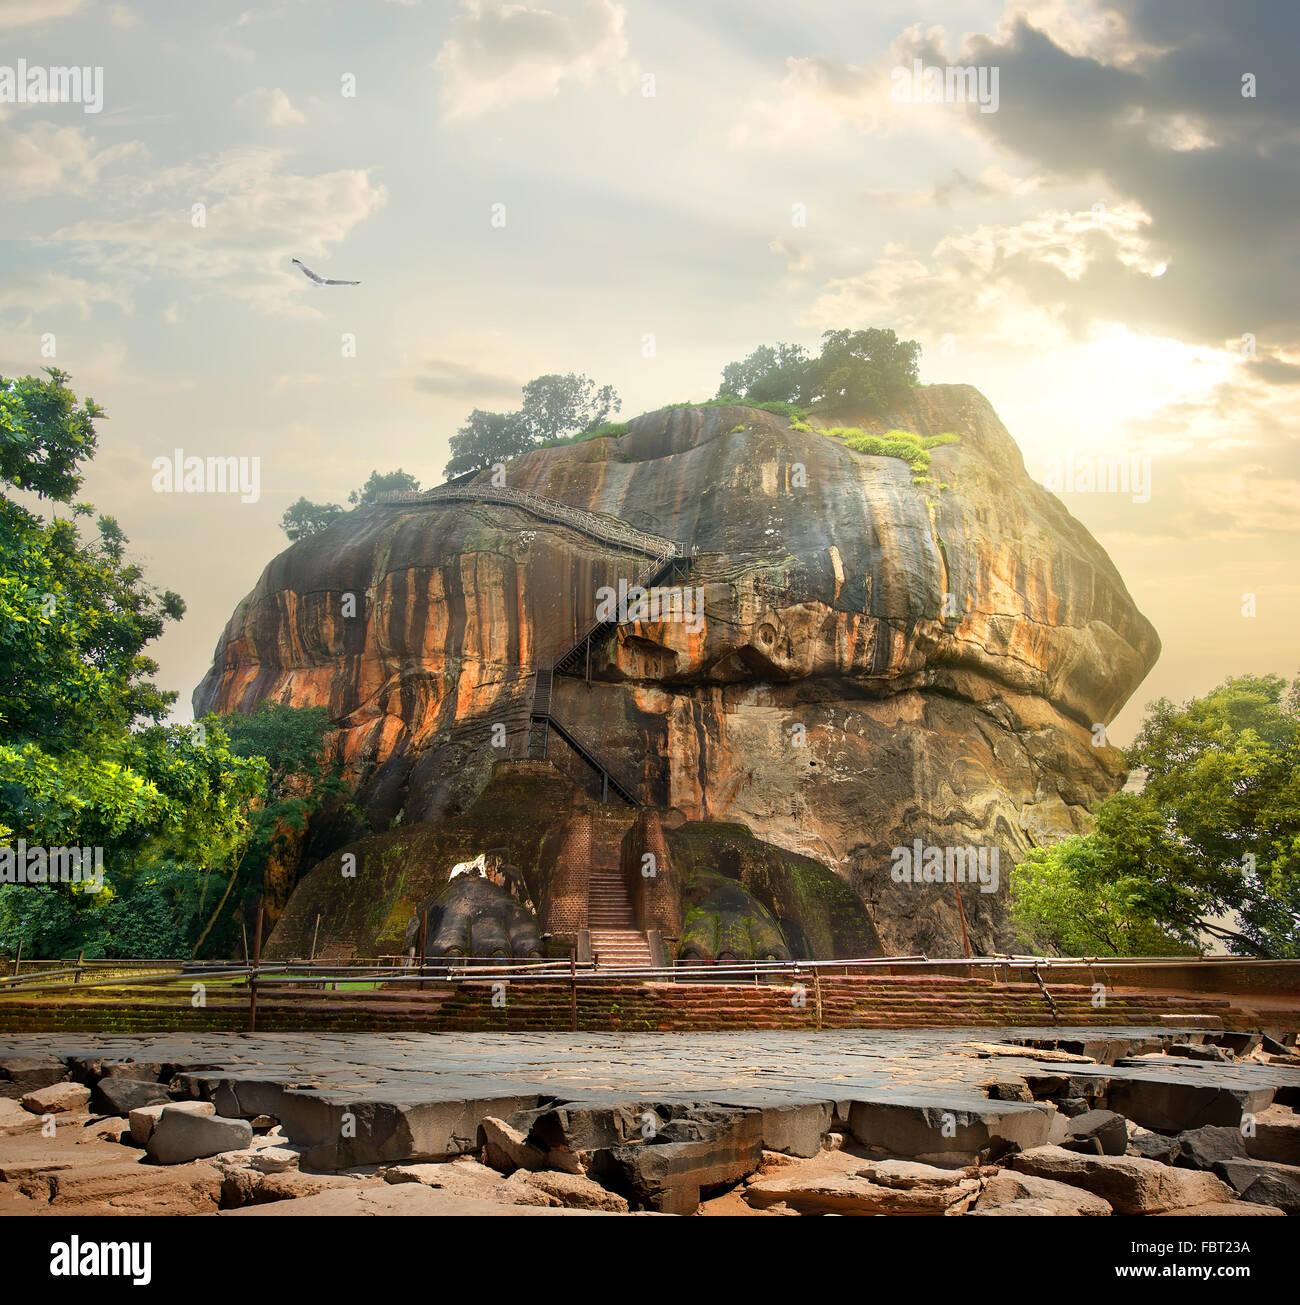 Bird over mountain of Sigiriya in Sri Lanka - Stock Image